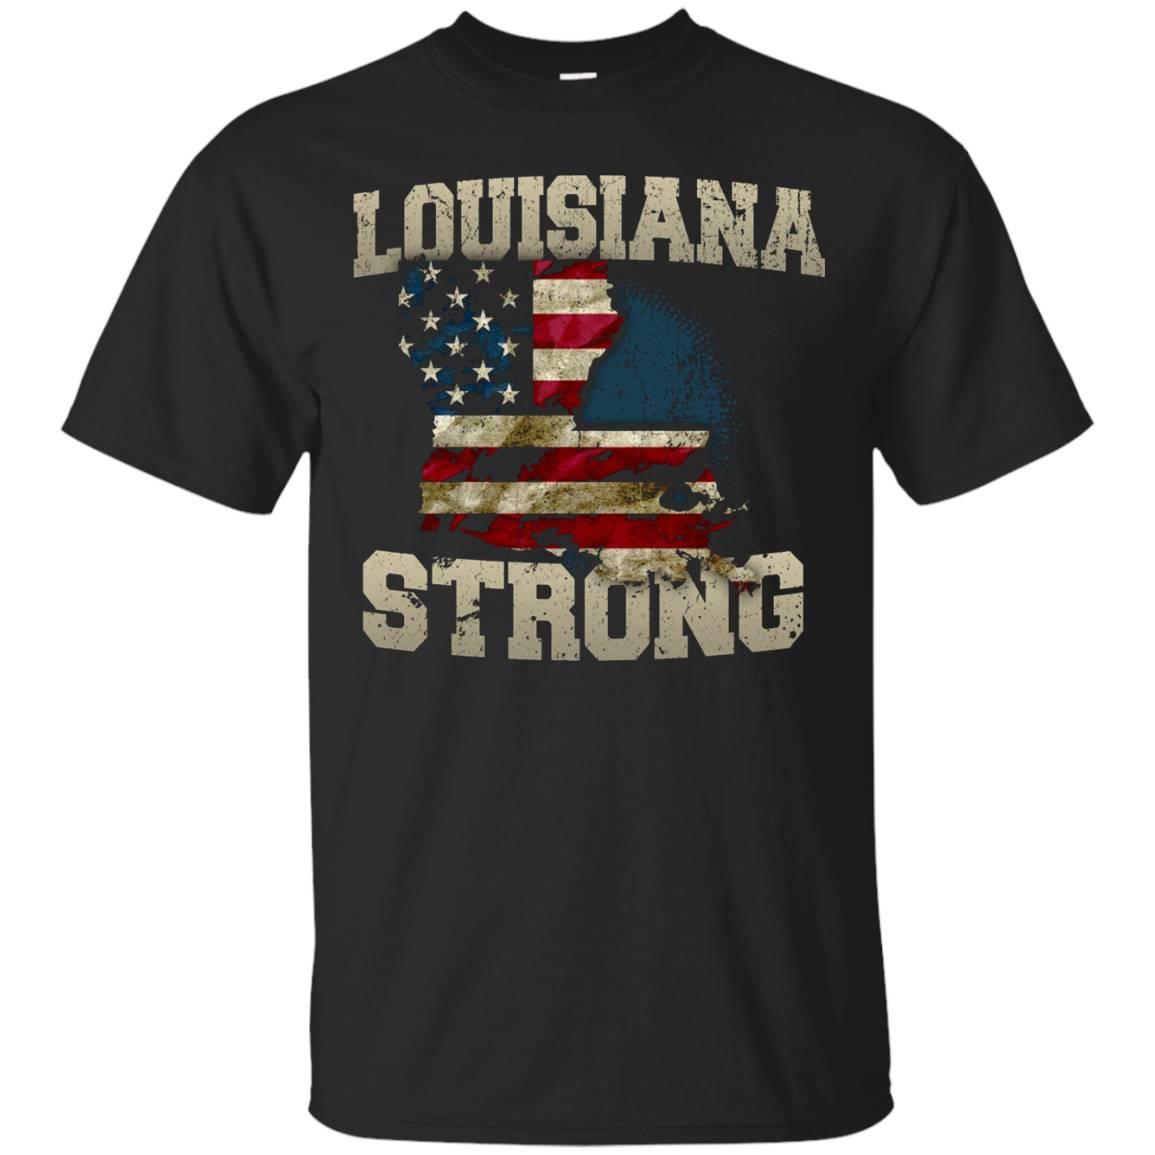 Louisianna Strong – Louisiana Flood #LouisianaStrong T-Shirt